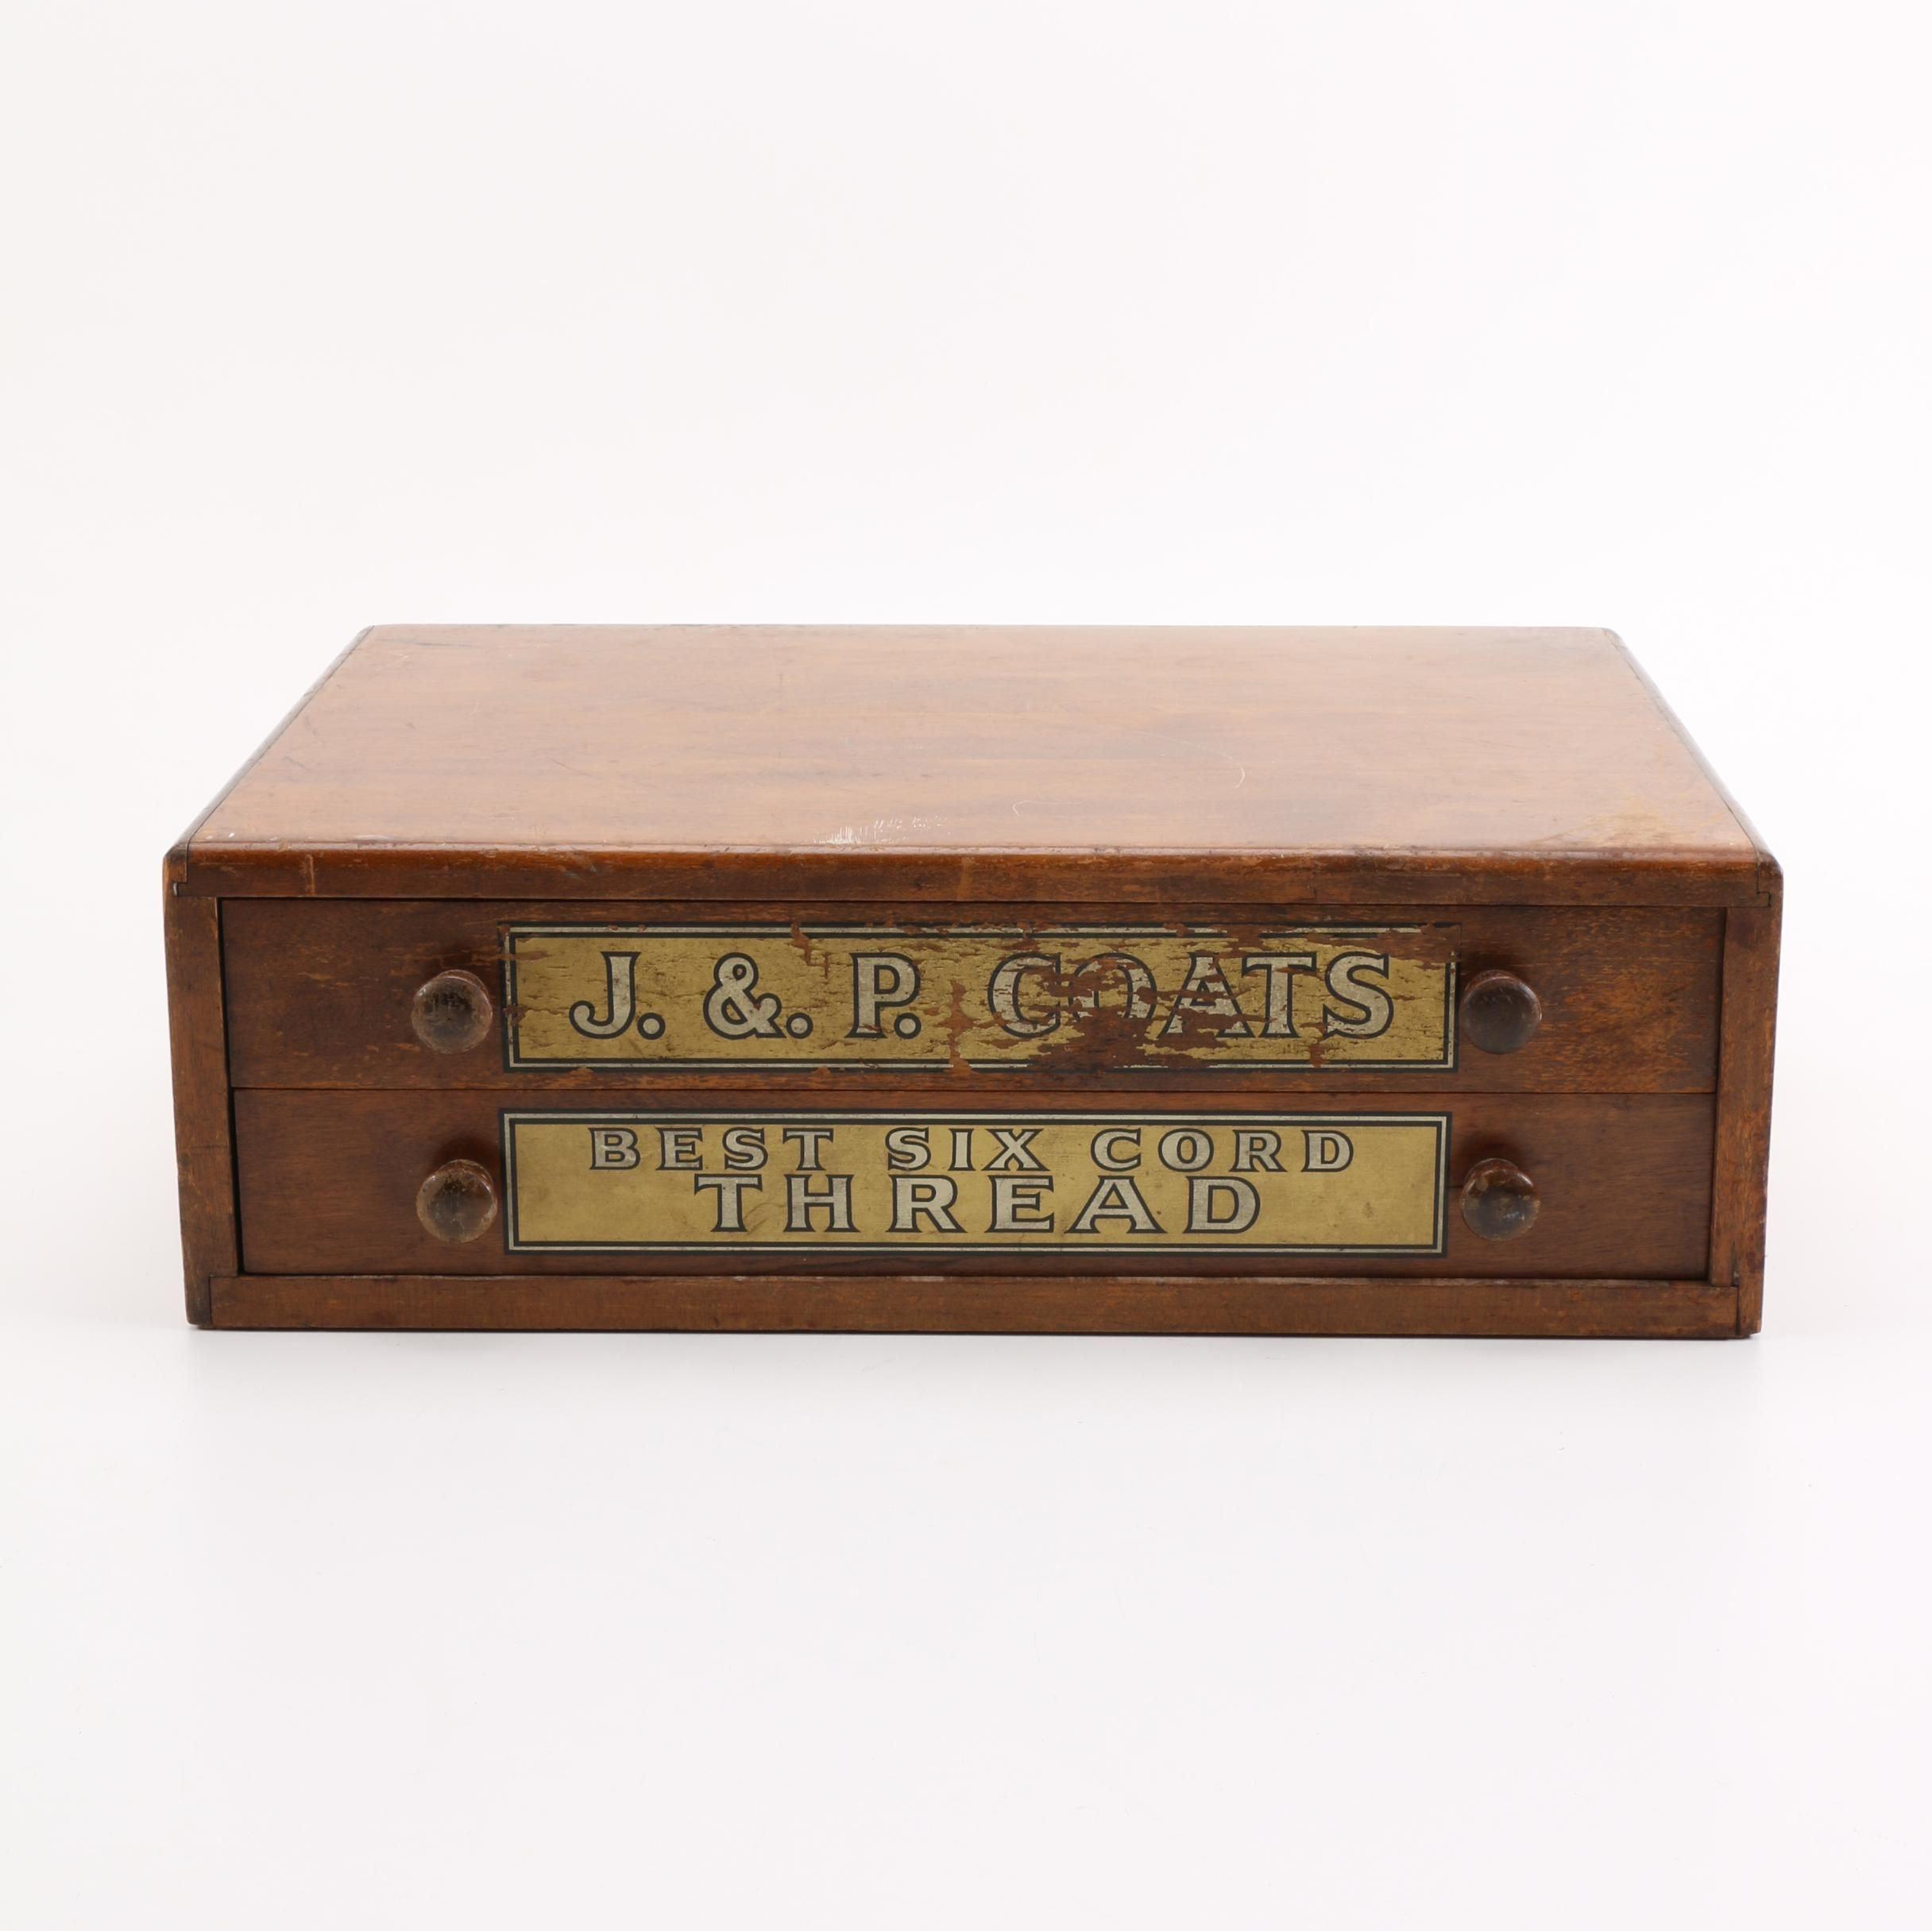 Vintage J. & P. Coats Wooden Thread Box